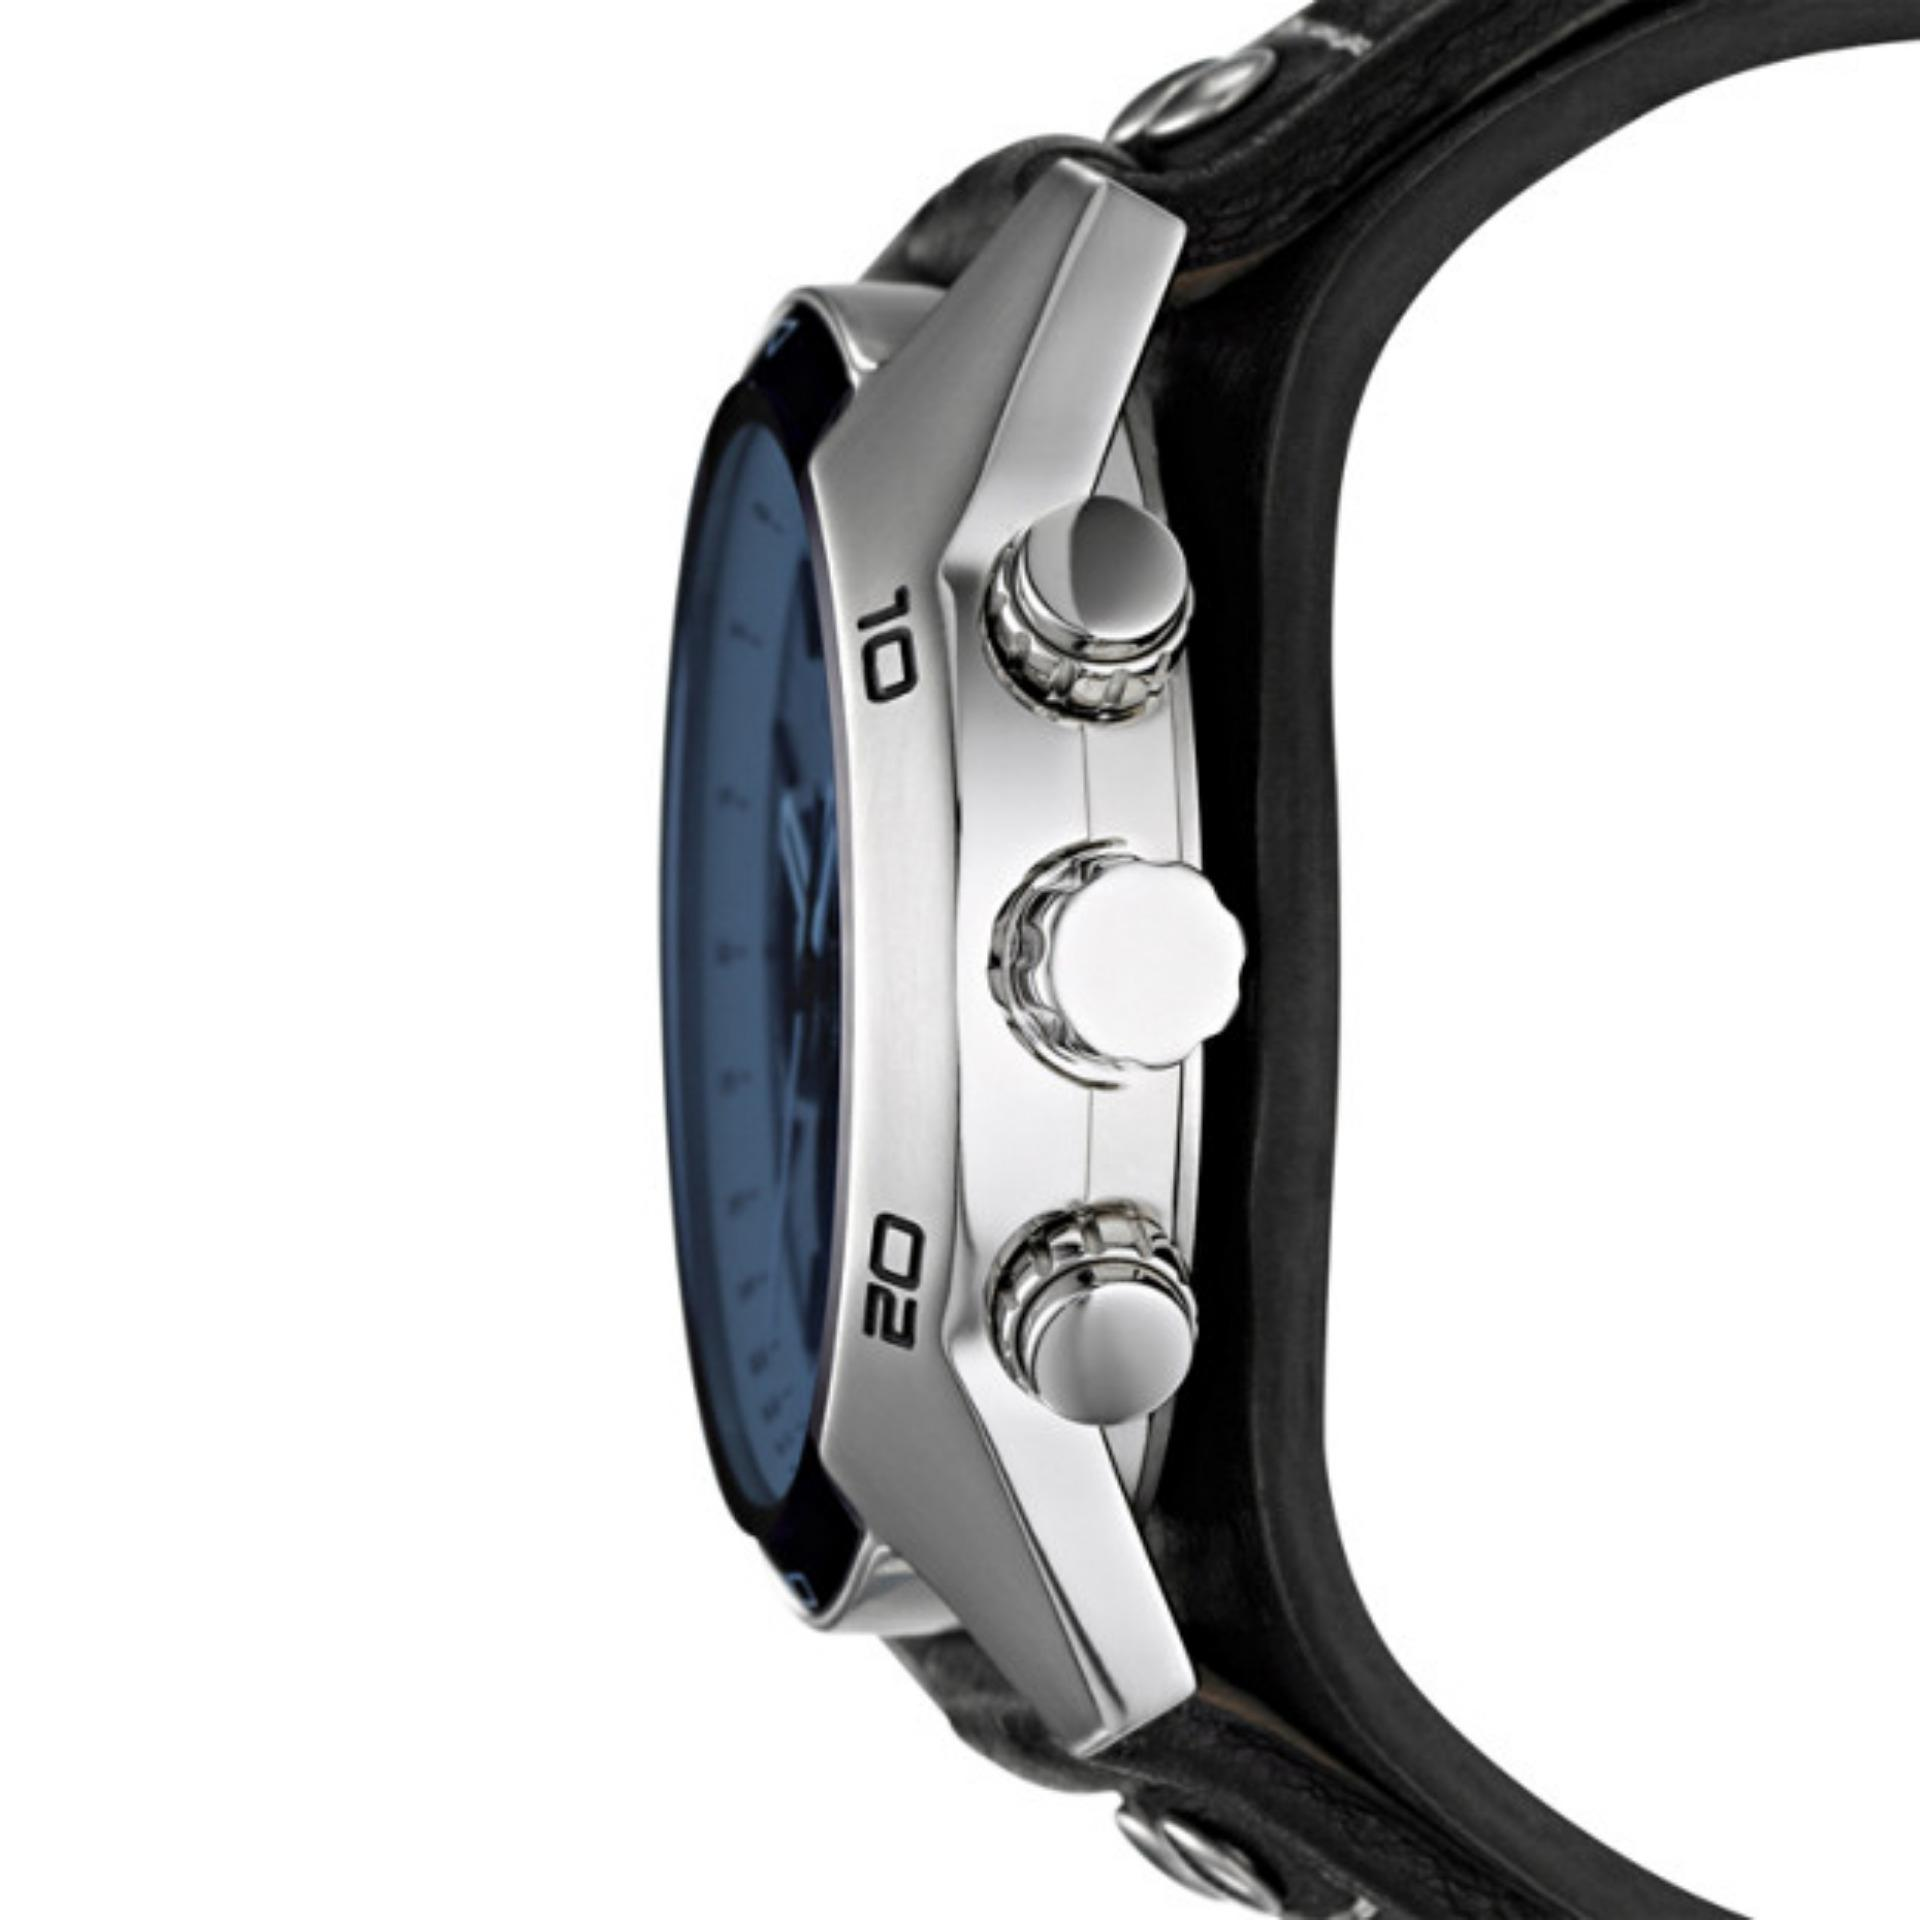 Fossil Ch2891 Coachman Chronograph Tachymeter Jam Tangan Pria Bahan Original Swatch Yvs431 Destination Roma Ch2564 Black Leather Watch